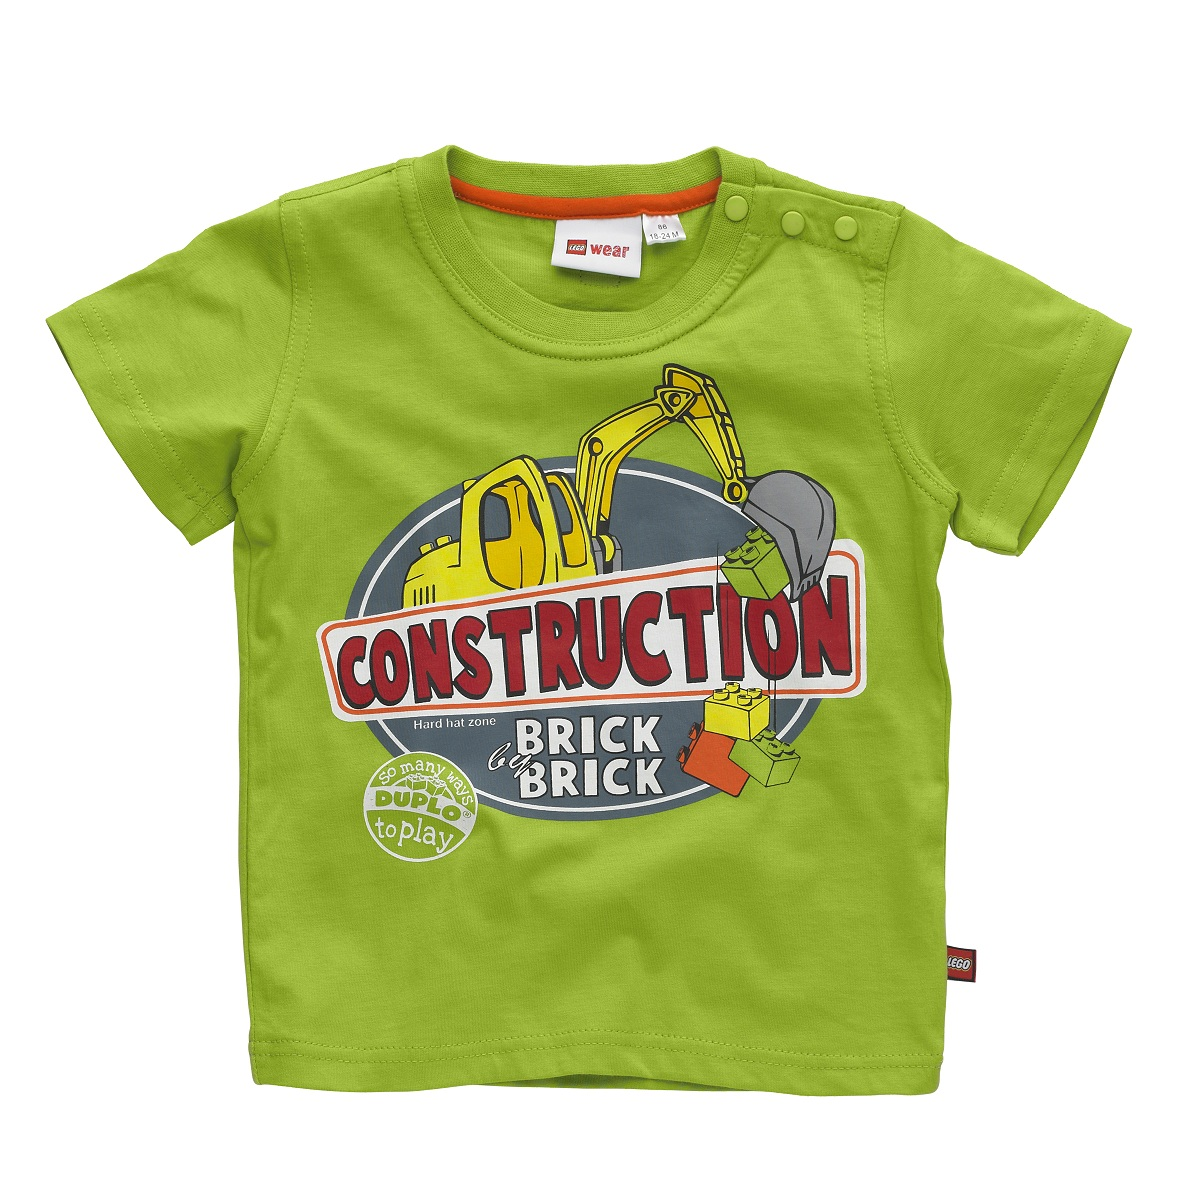 LEGOkläder - LEGO Wear Duplo kortärmad t-shirt TINO 304 - Bokextra b84a0a092eabc